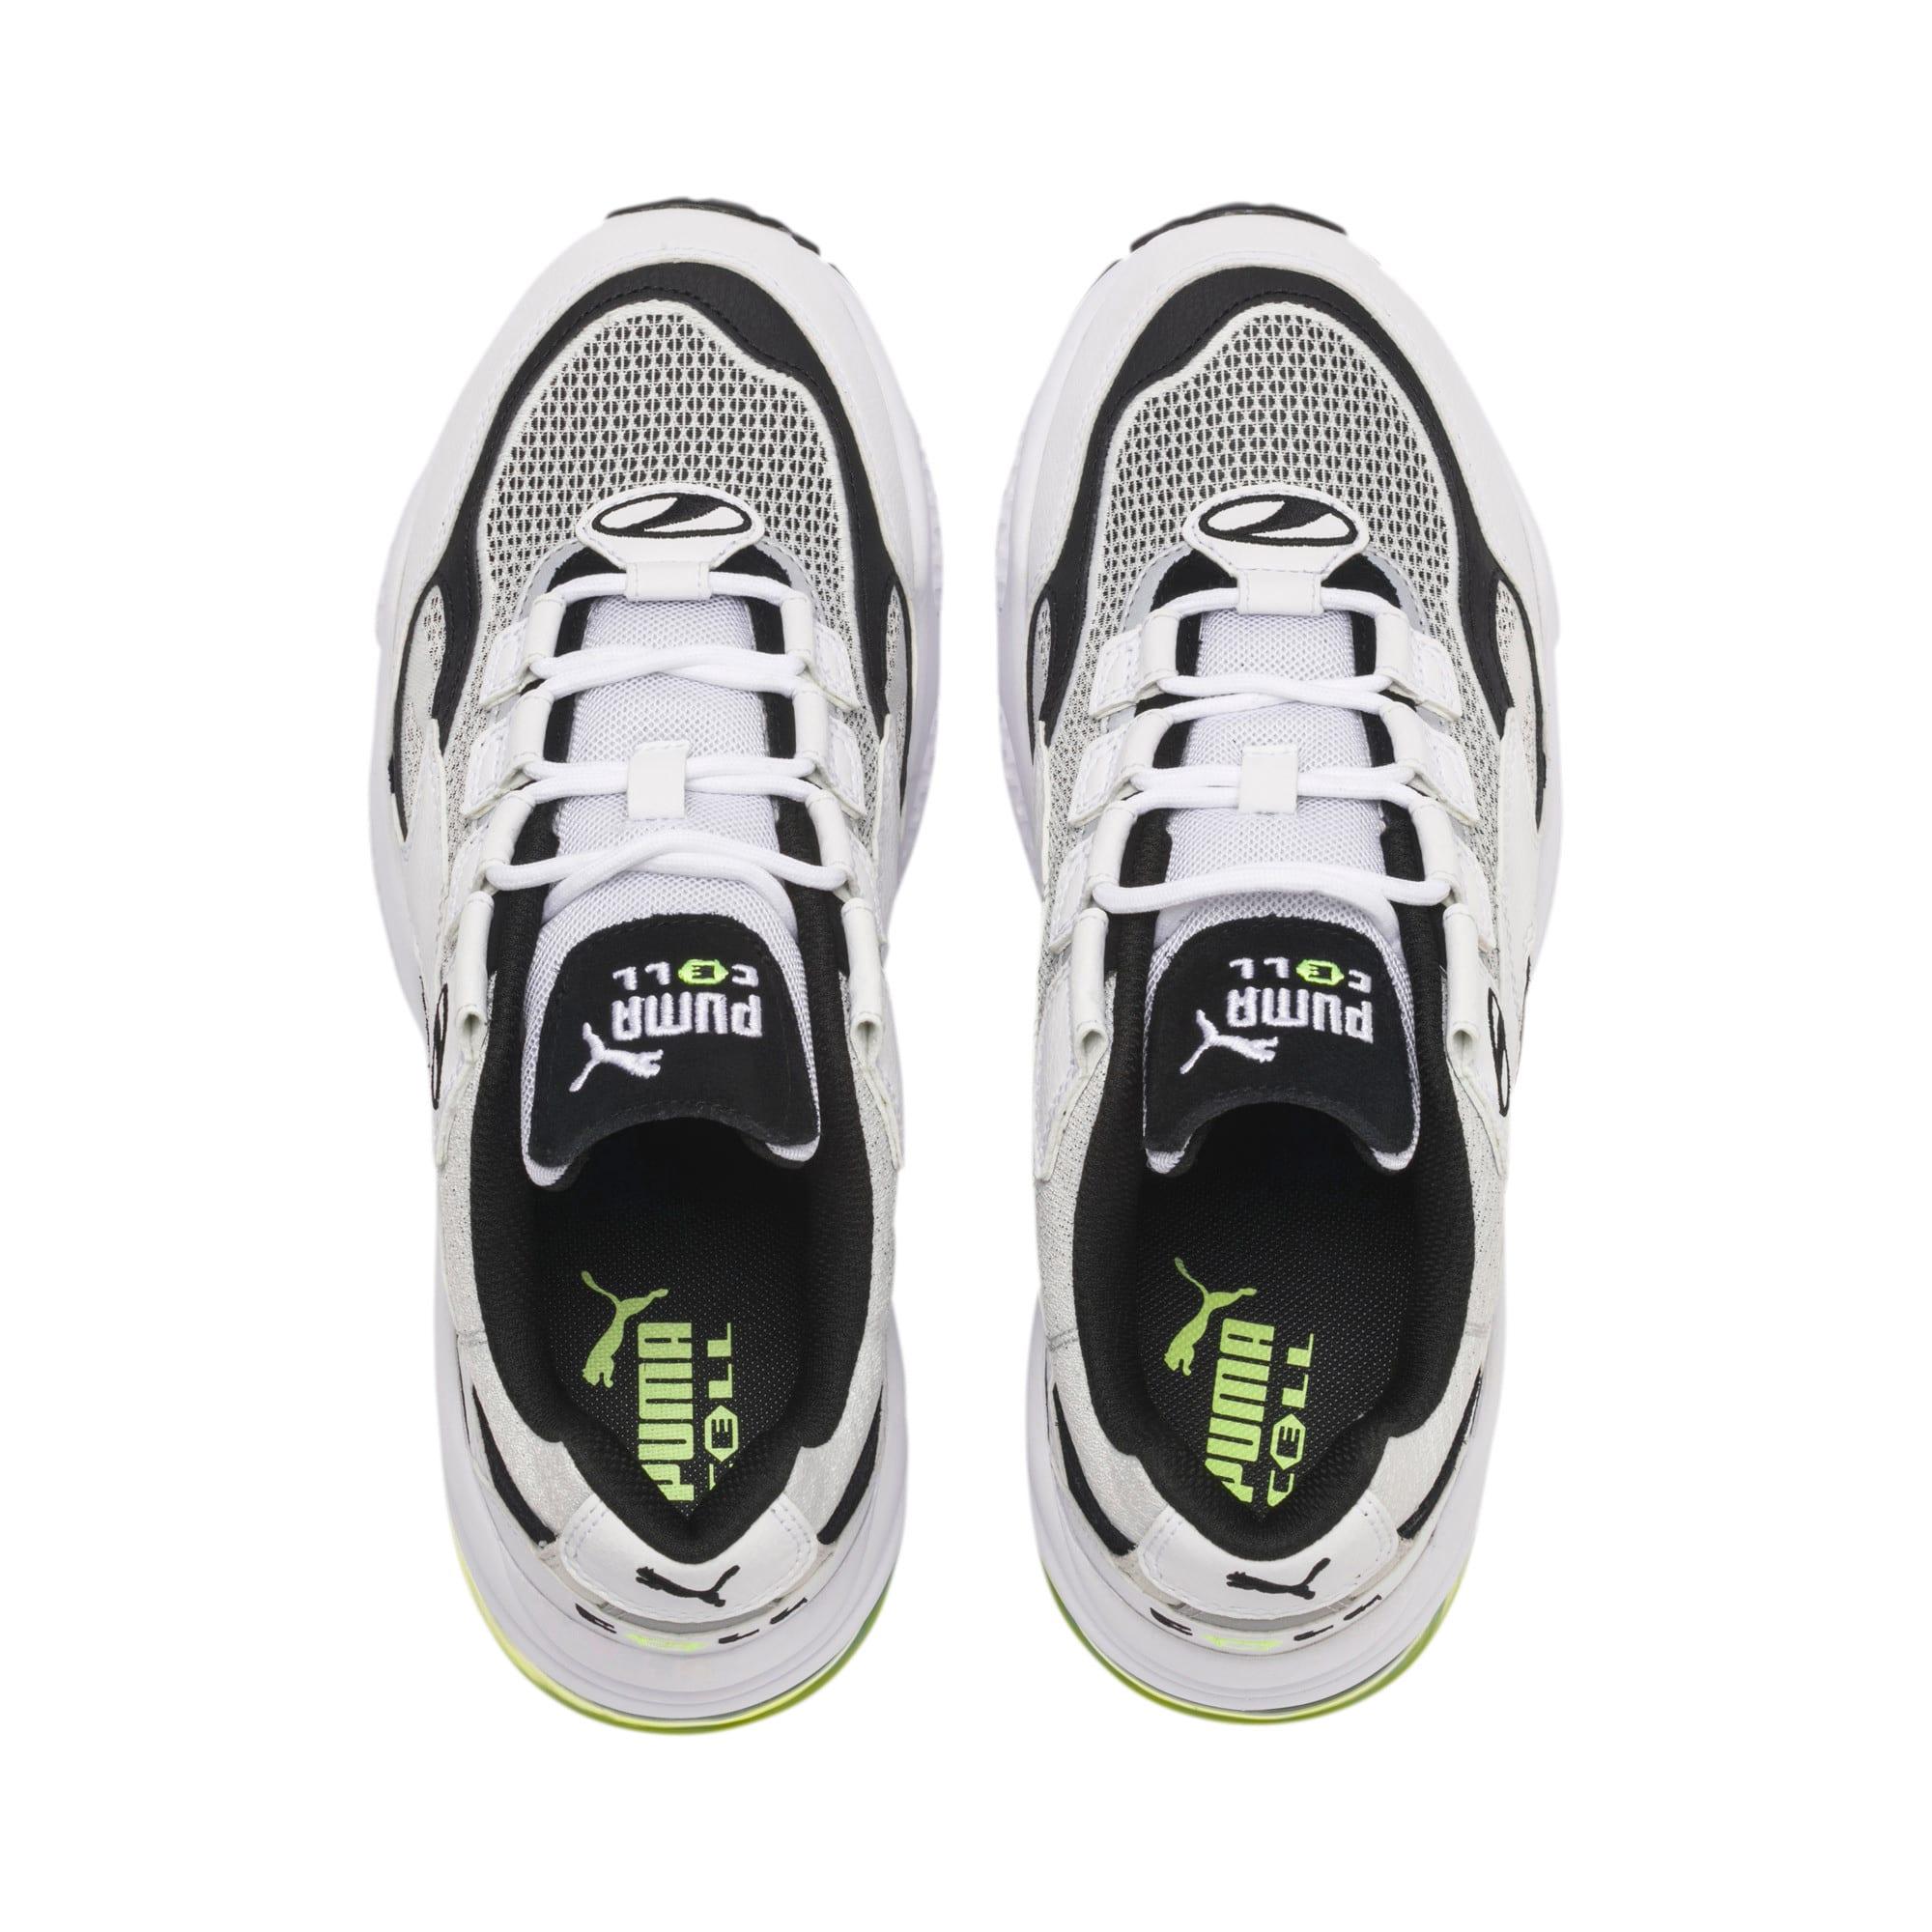 Thumbnail 7 of CELL Venom Alert Sneakers, Puma White-Puma Black, medium